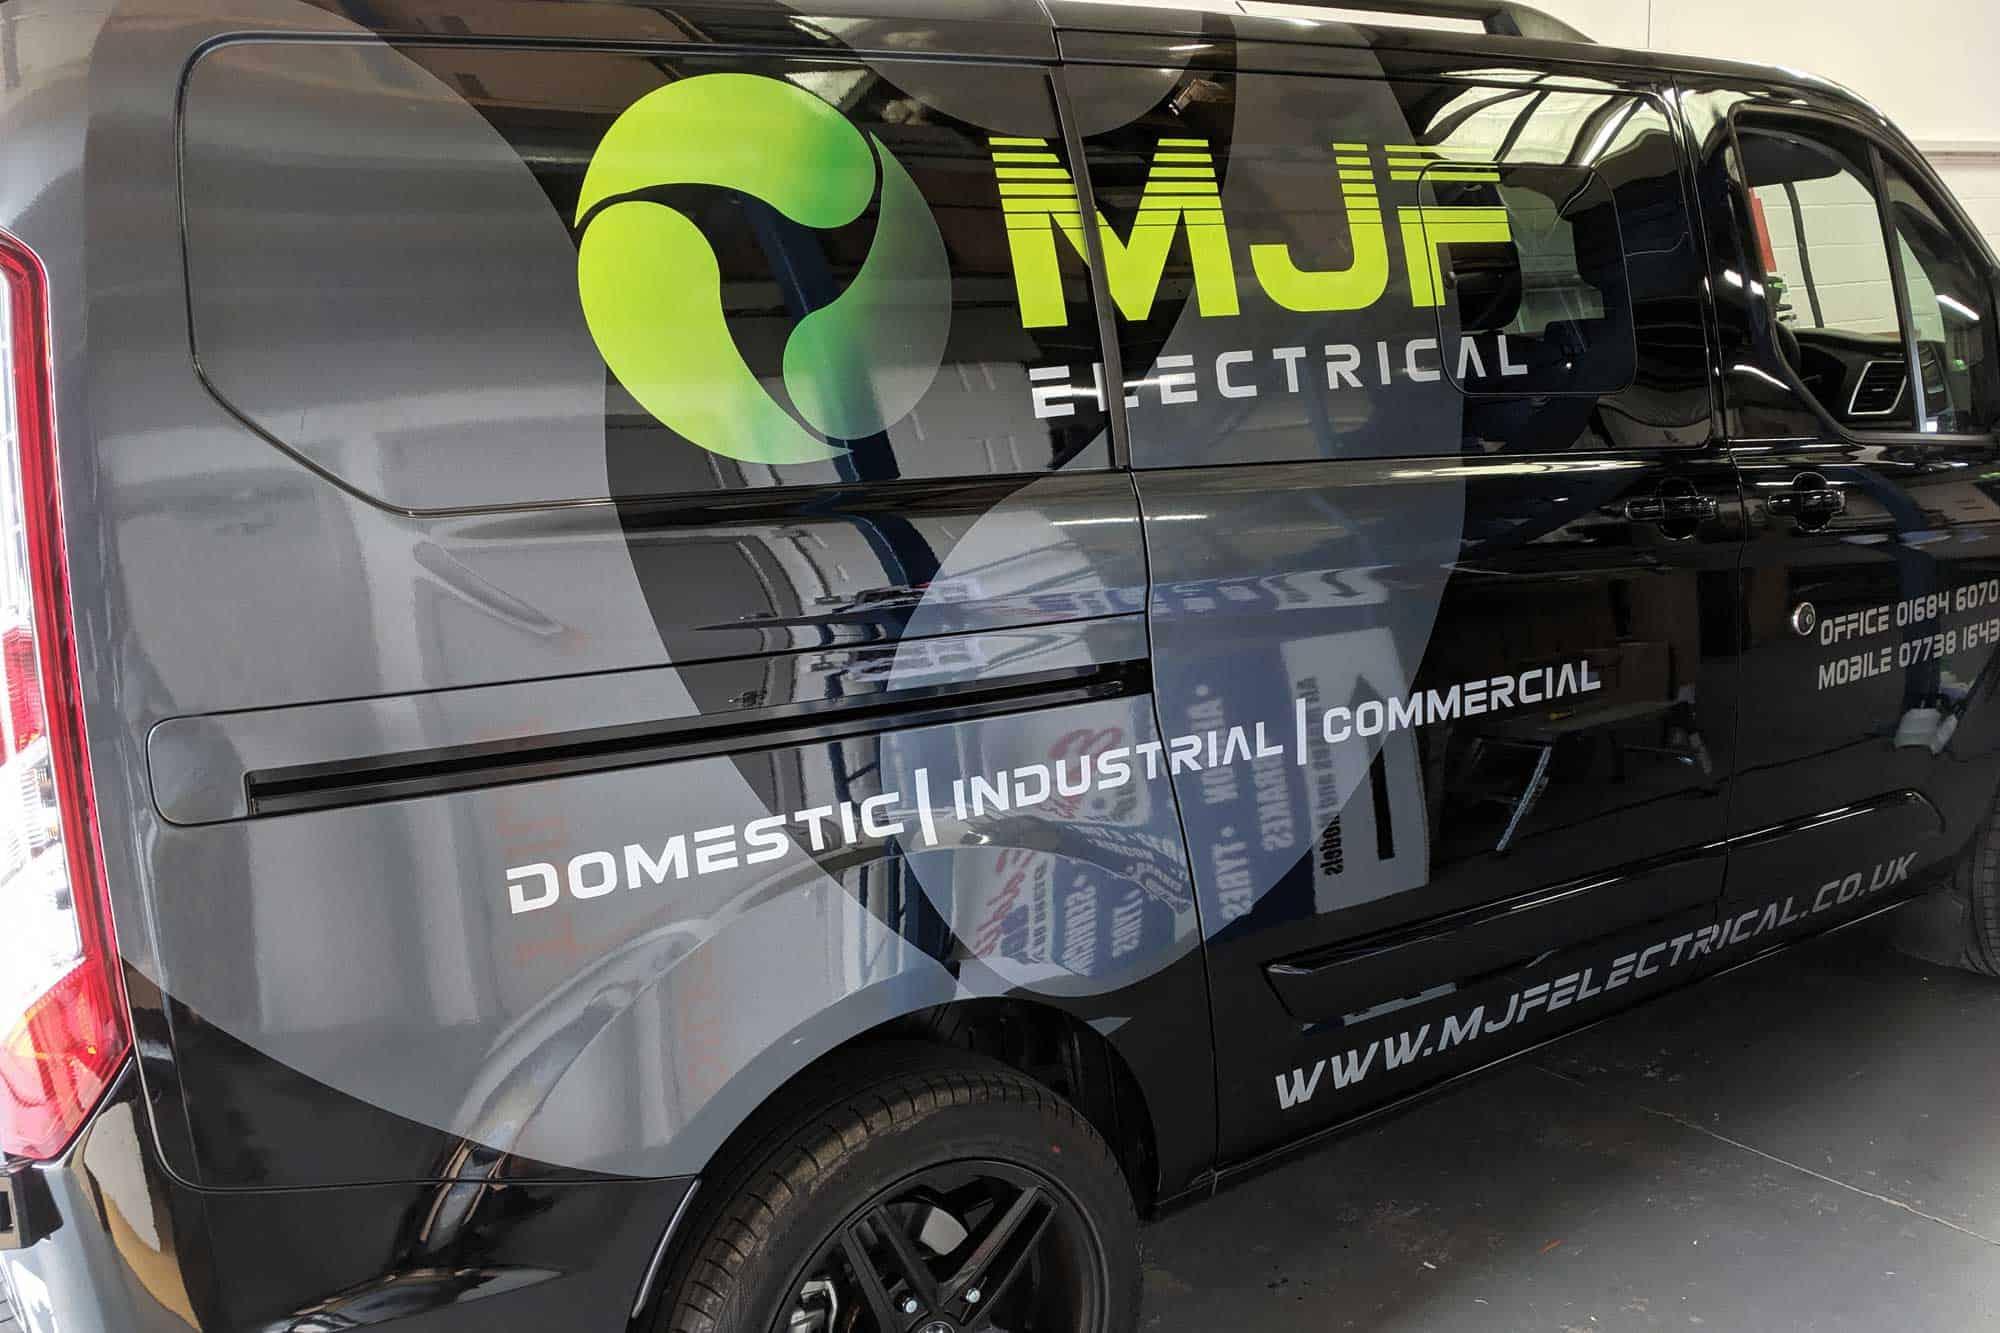 MJF Electrical Transit Custom